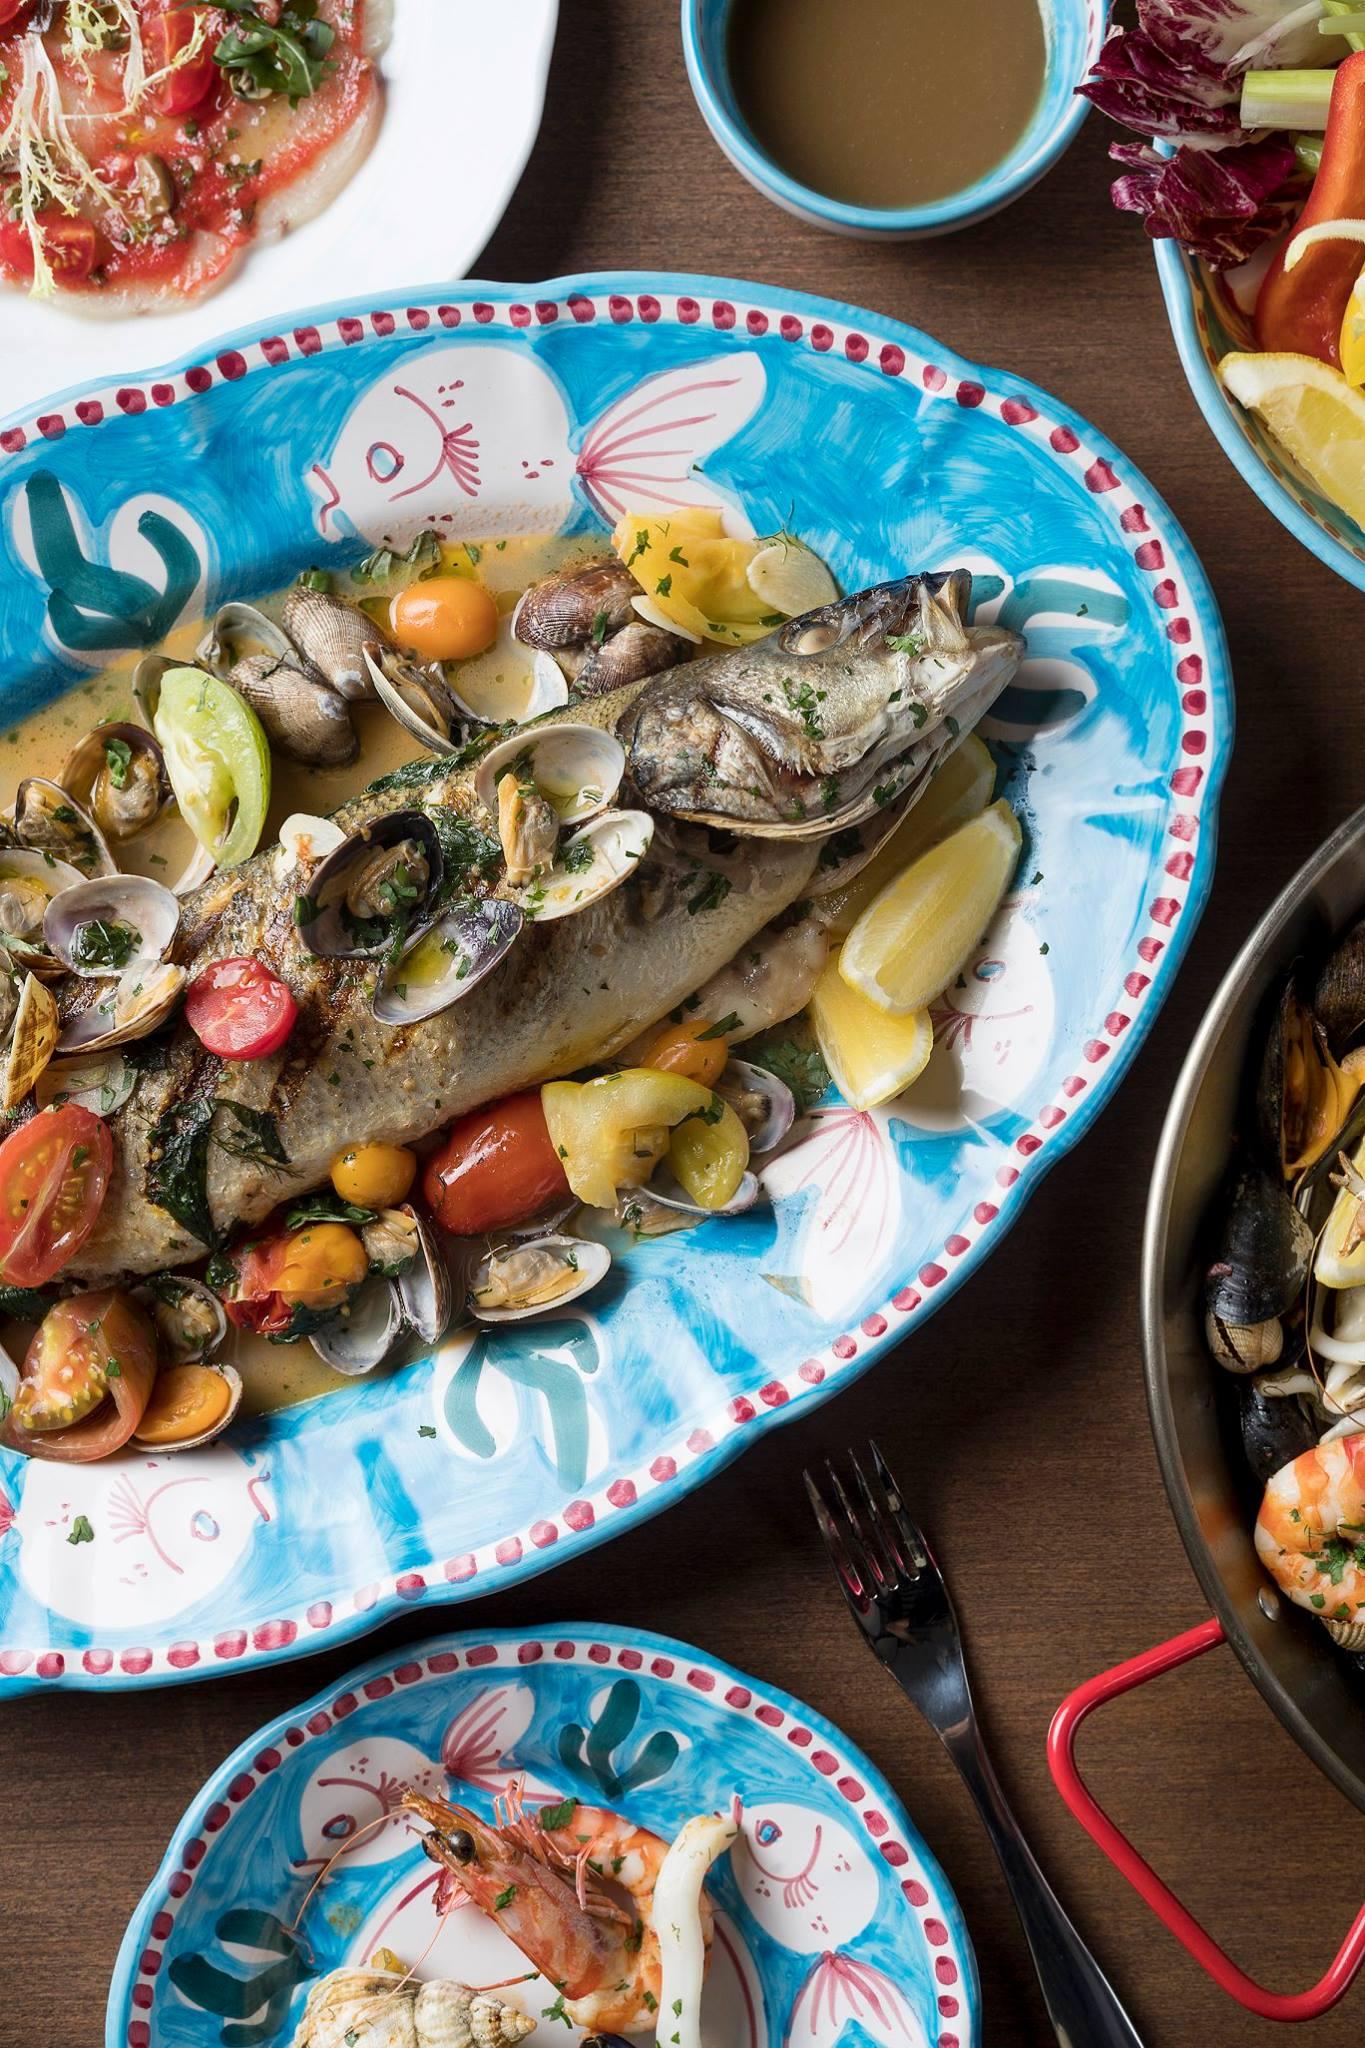 181016 Dish-Branzino Acqua Pazza served with fresh clams, olives and cherry tomatoes..jpg